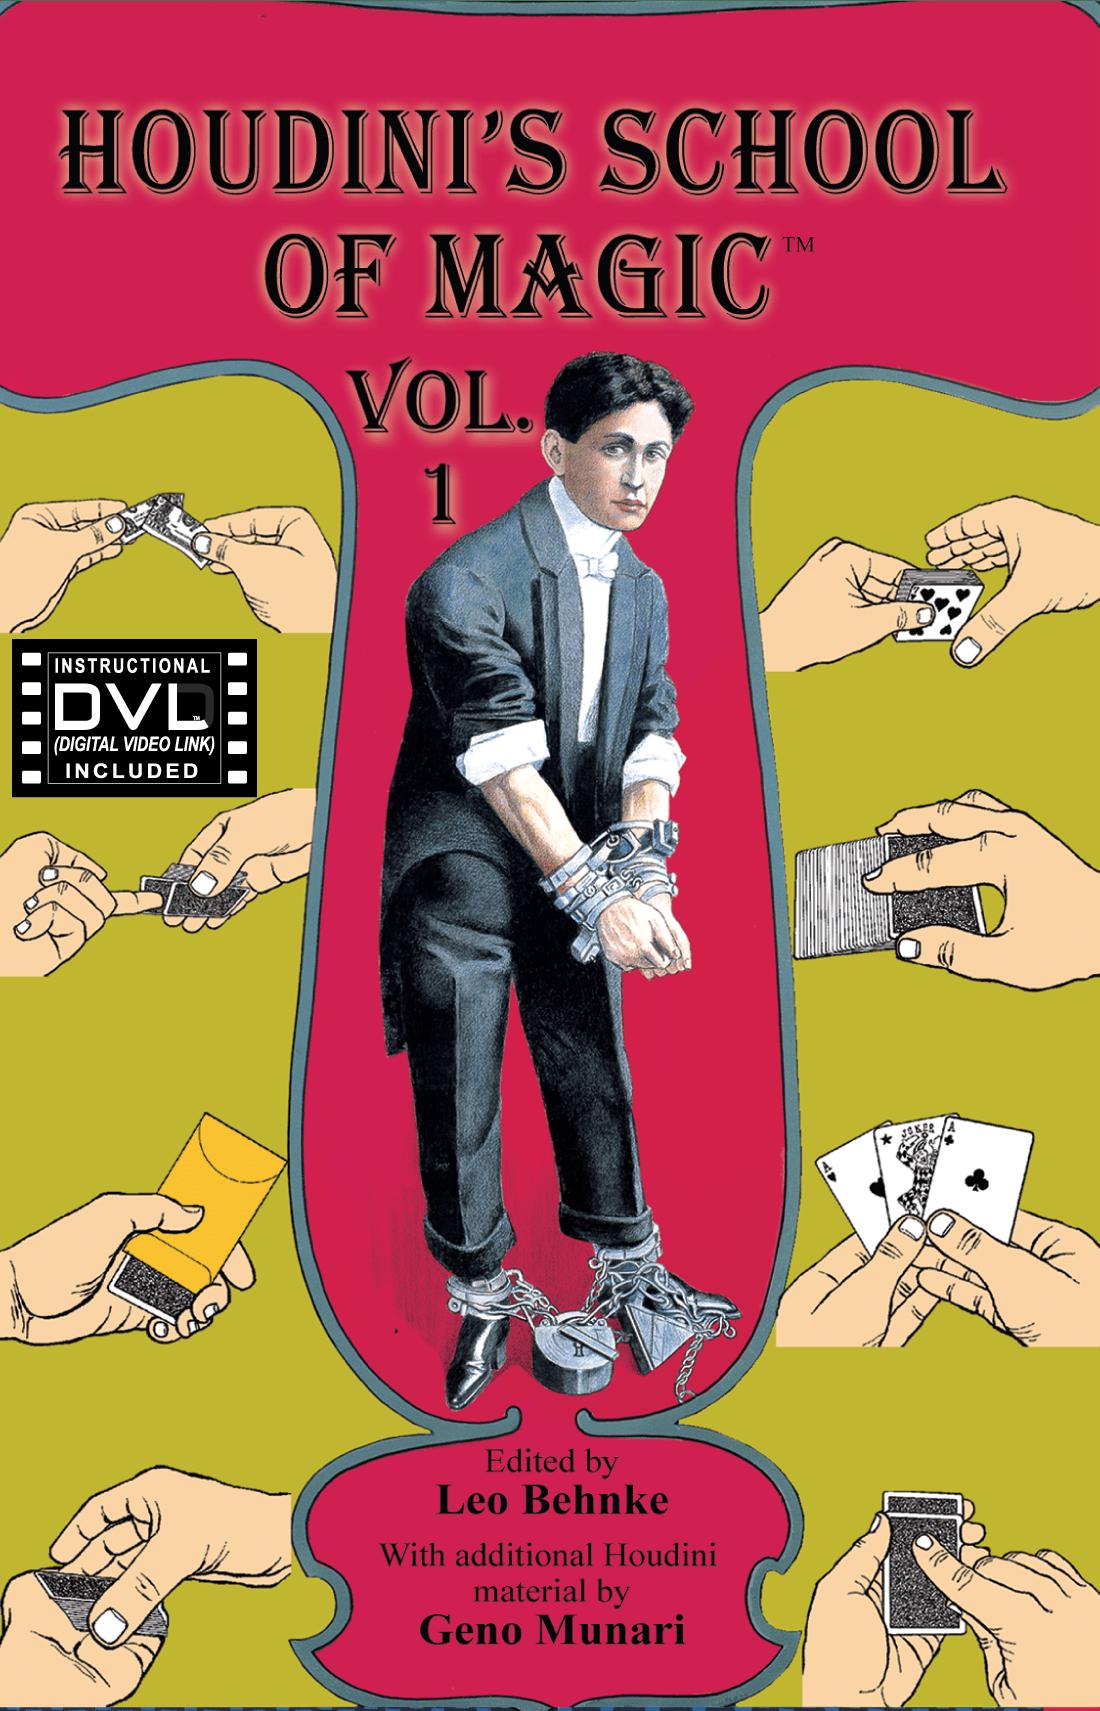 Houdini's School of Magic Teaching DVL